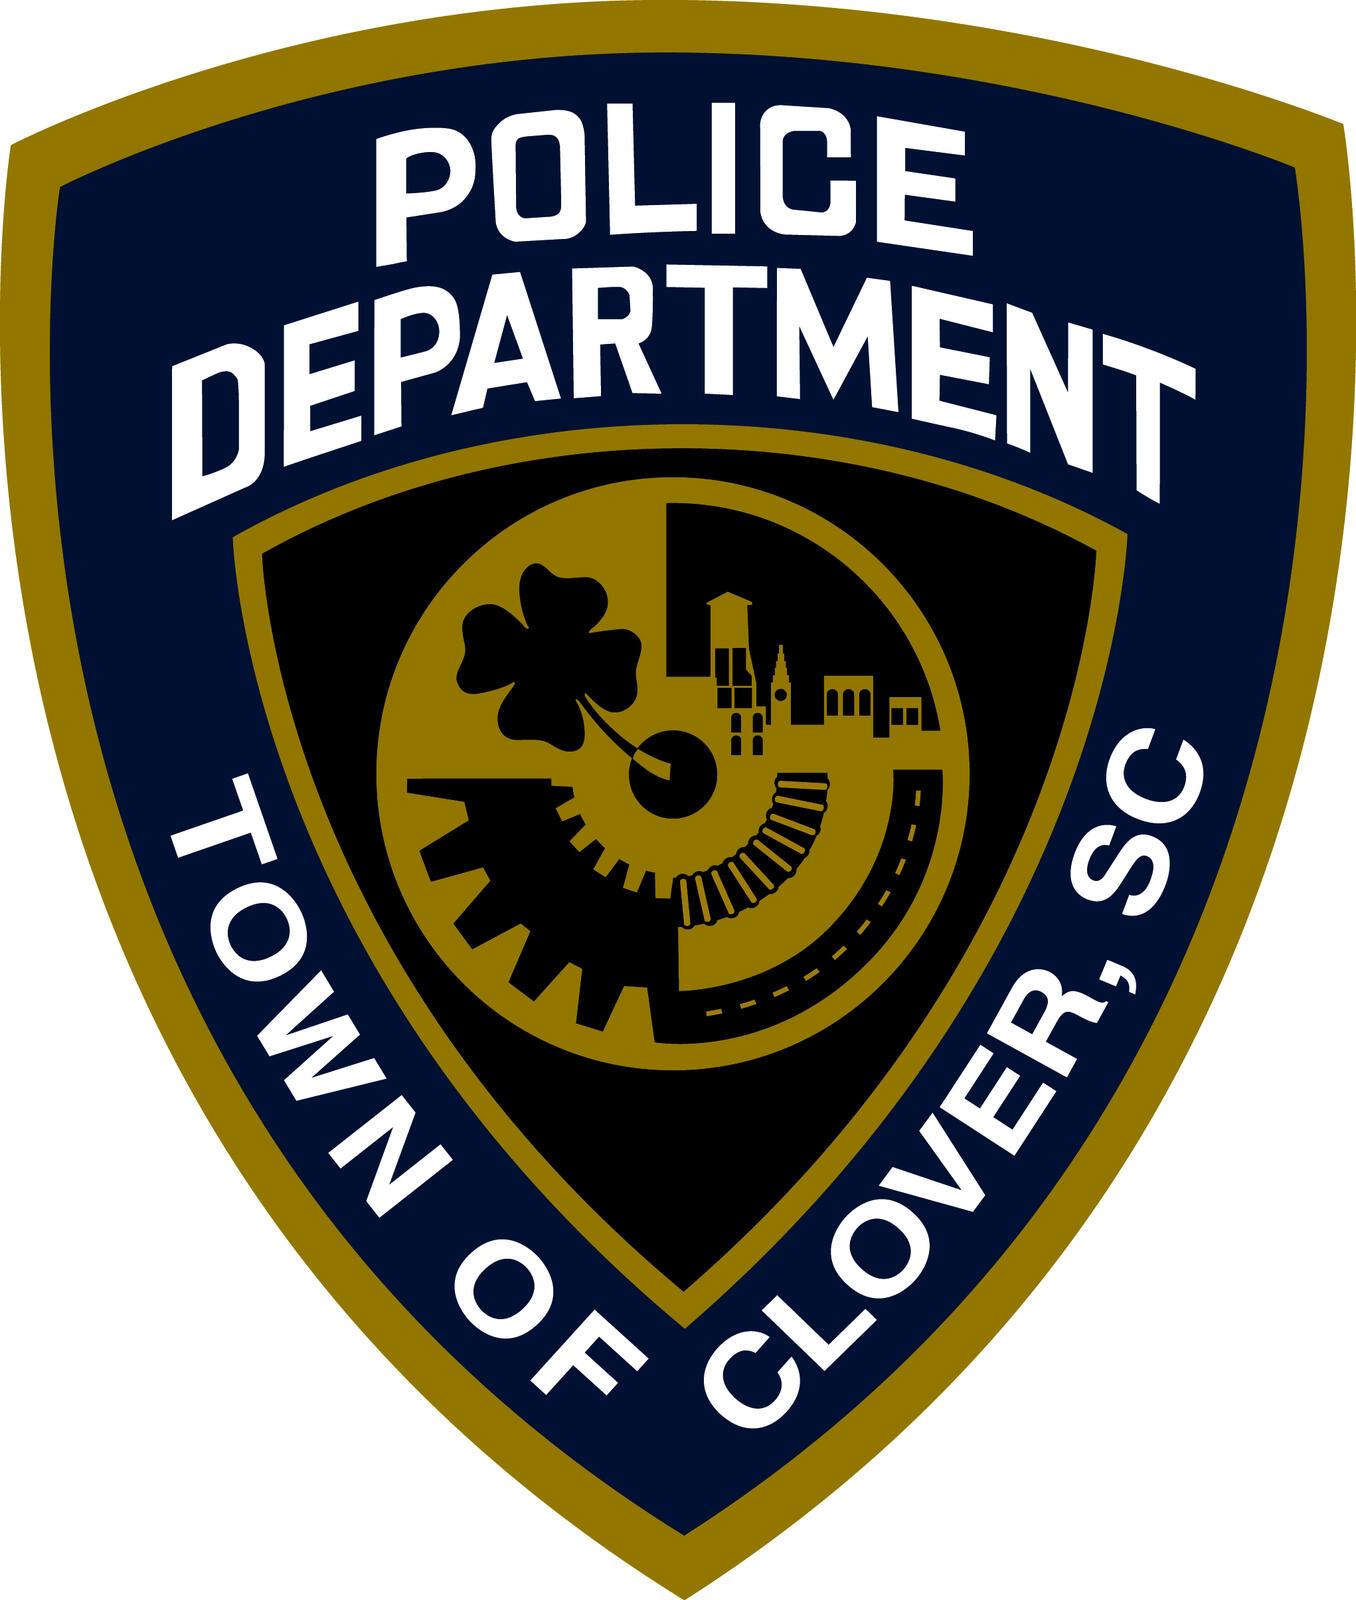 clover police department 8 crime and safety updates nextdoor. Black Bedroom Furniture Sets. Home Design Ideas